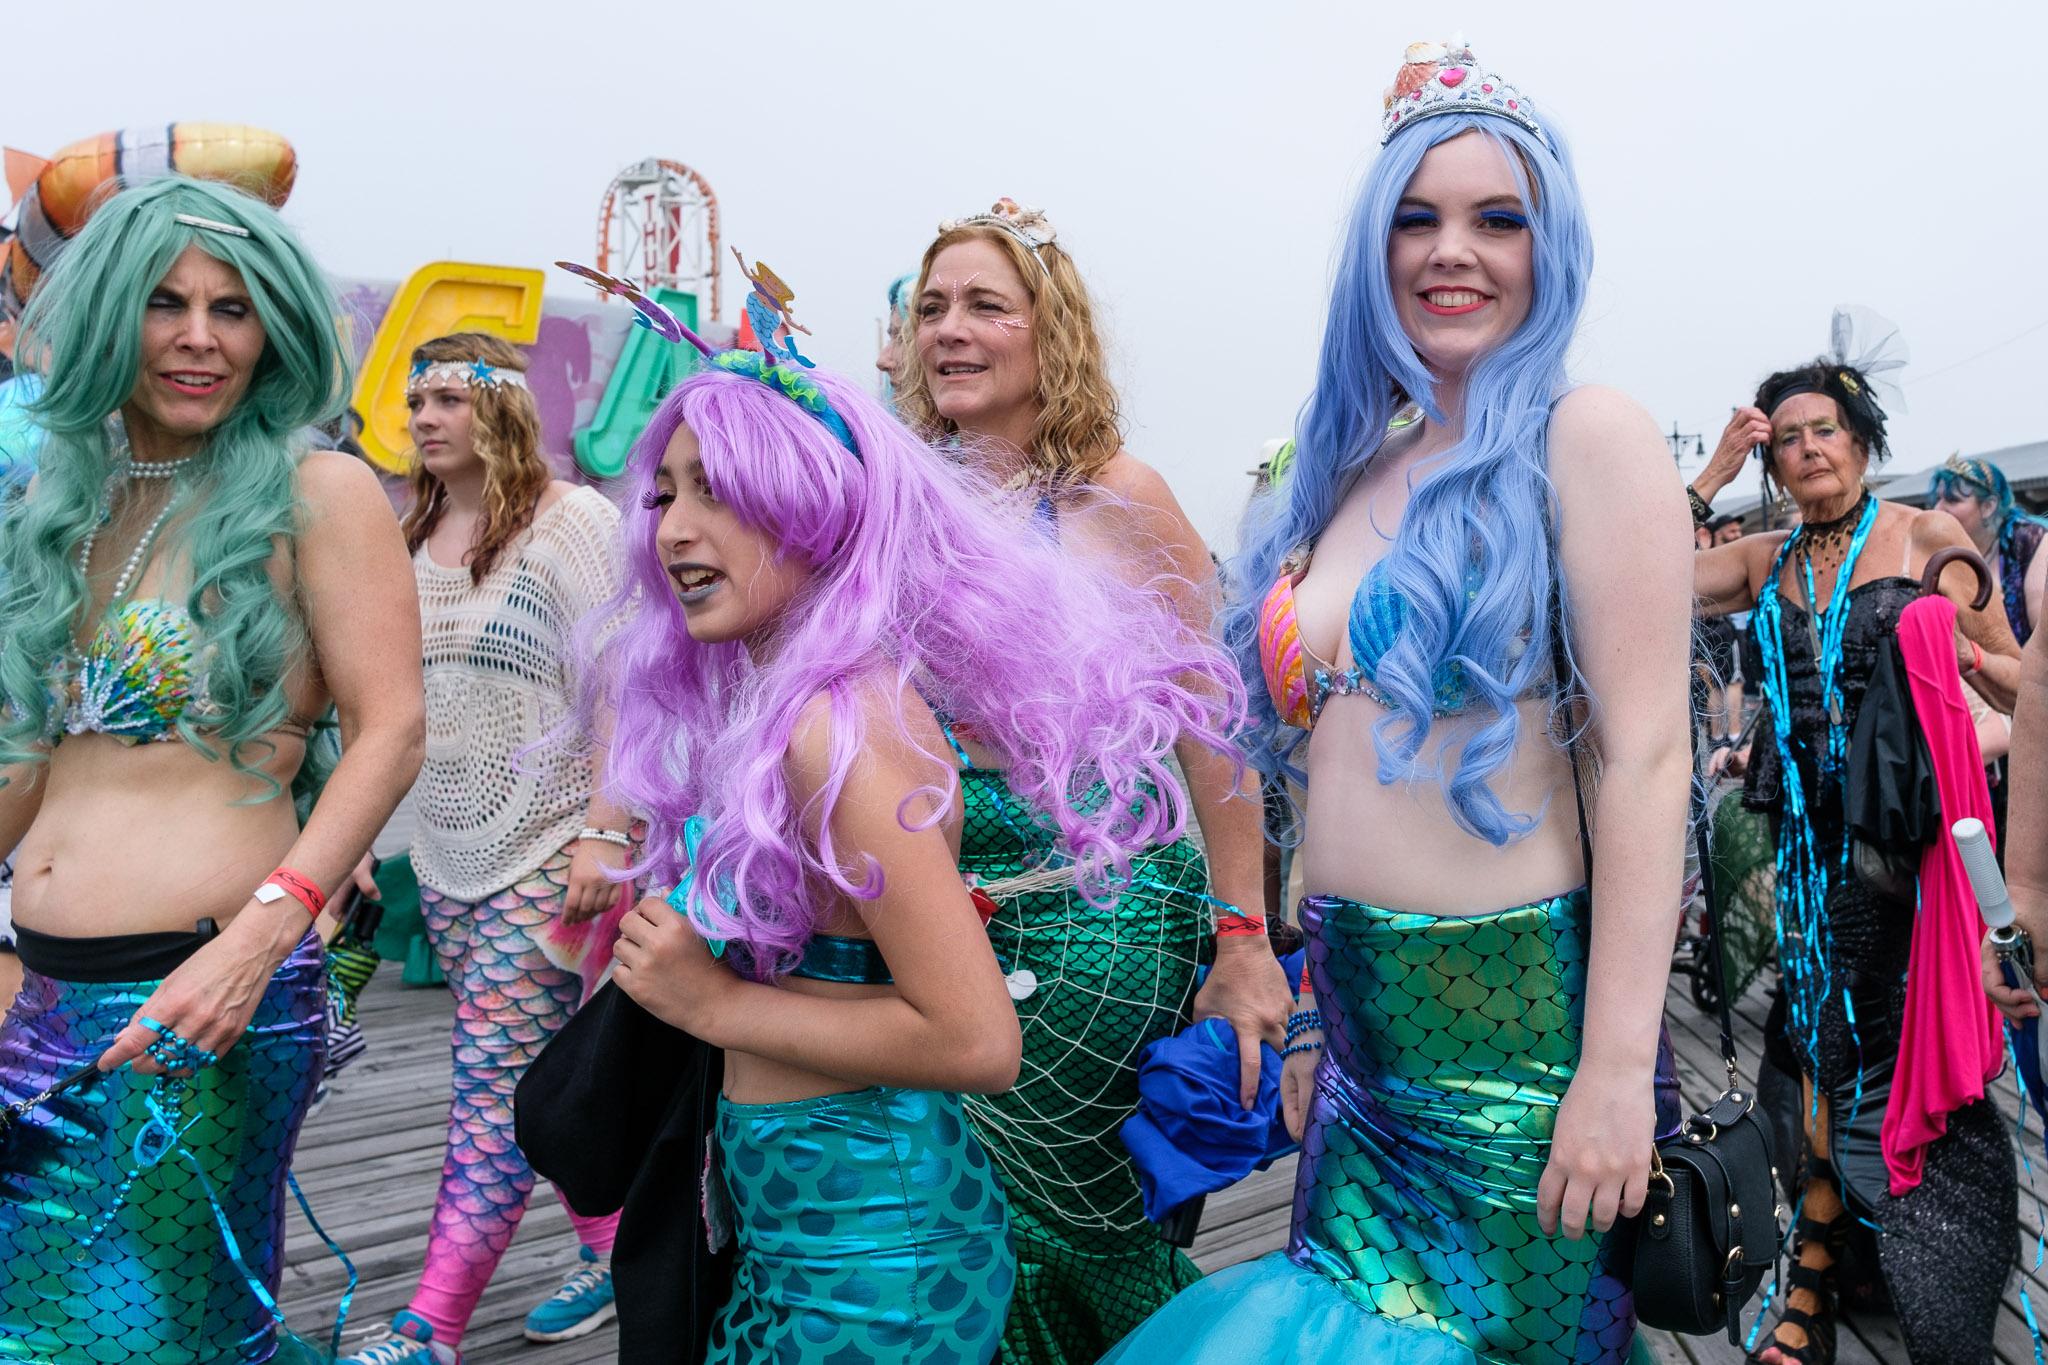 mermaidparade2017_022.jpg